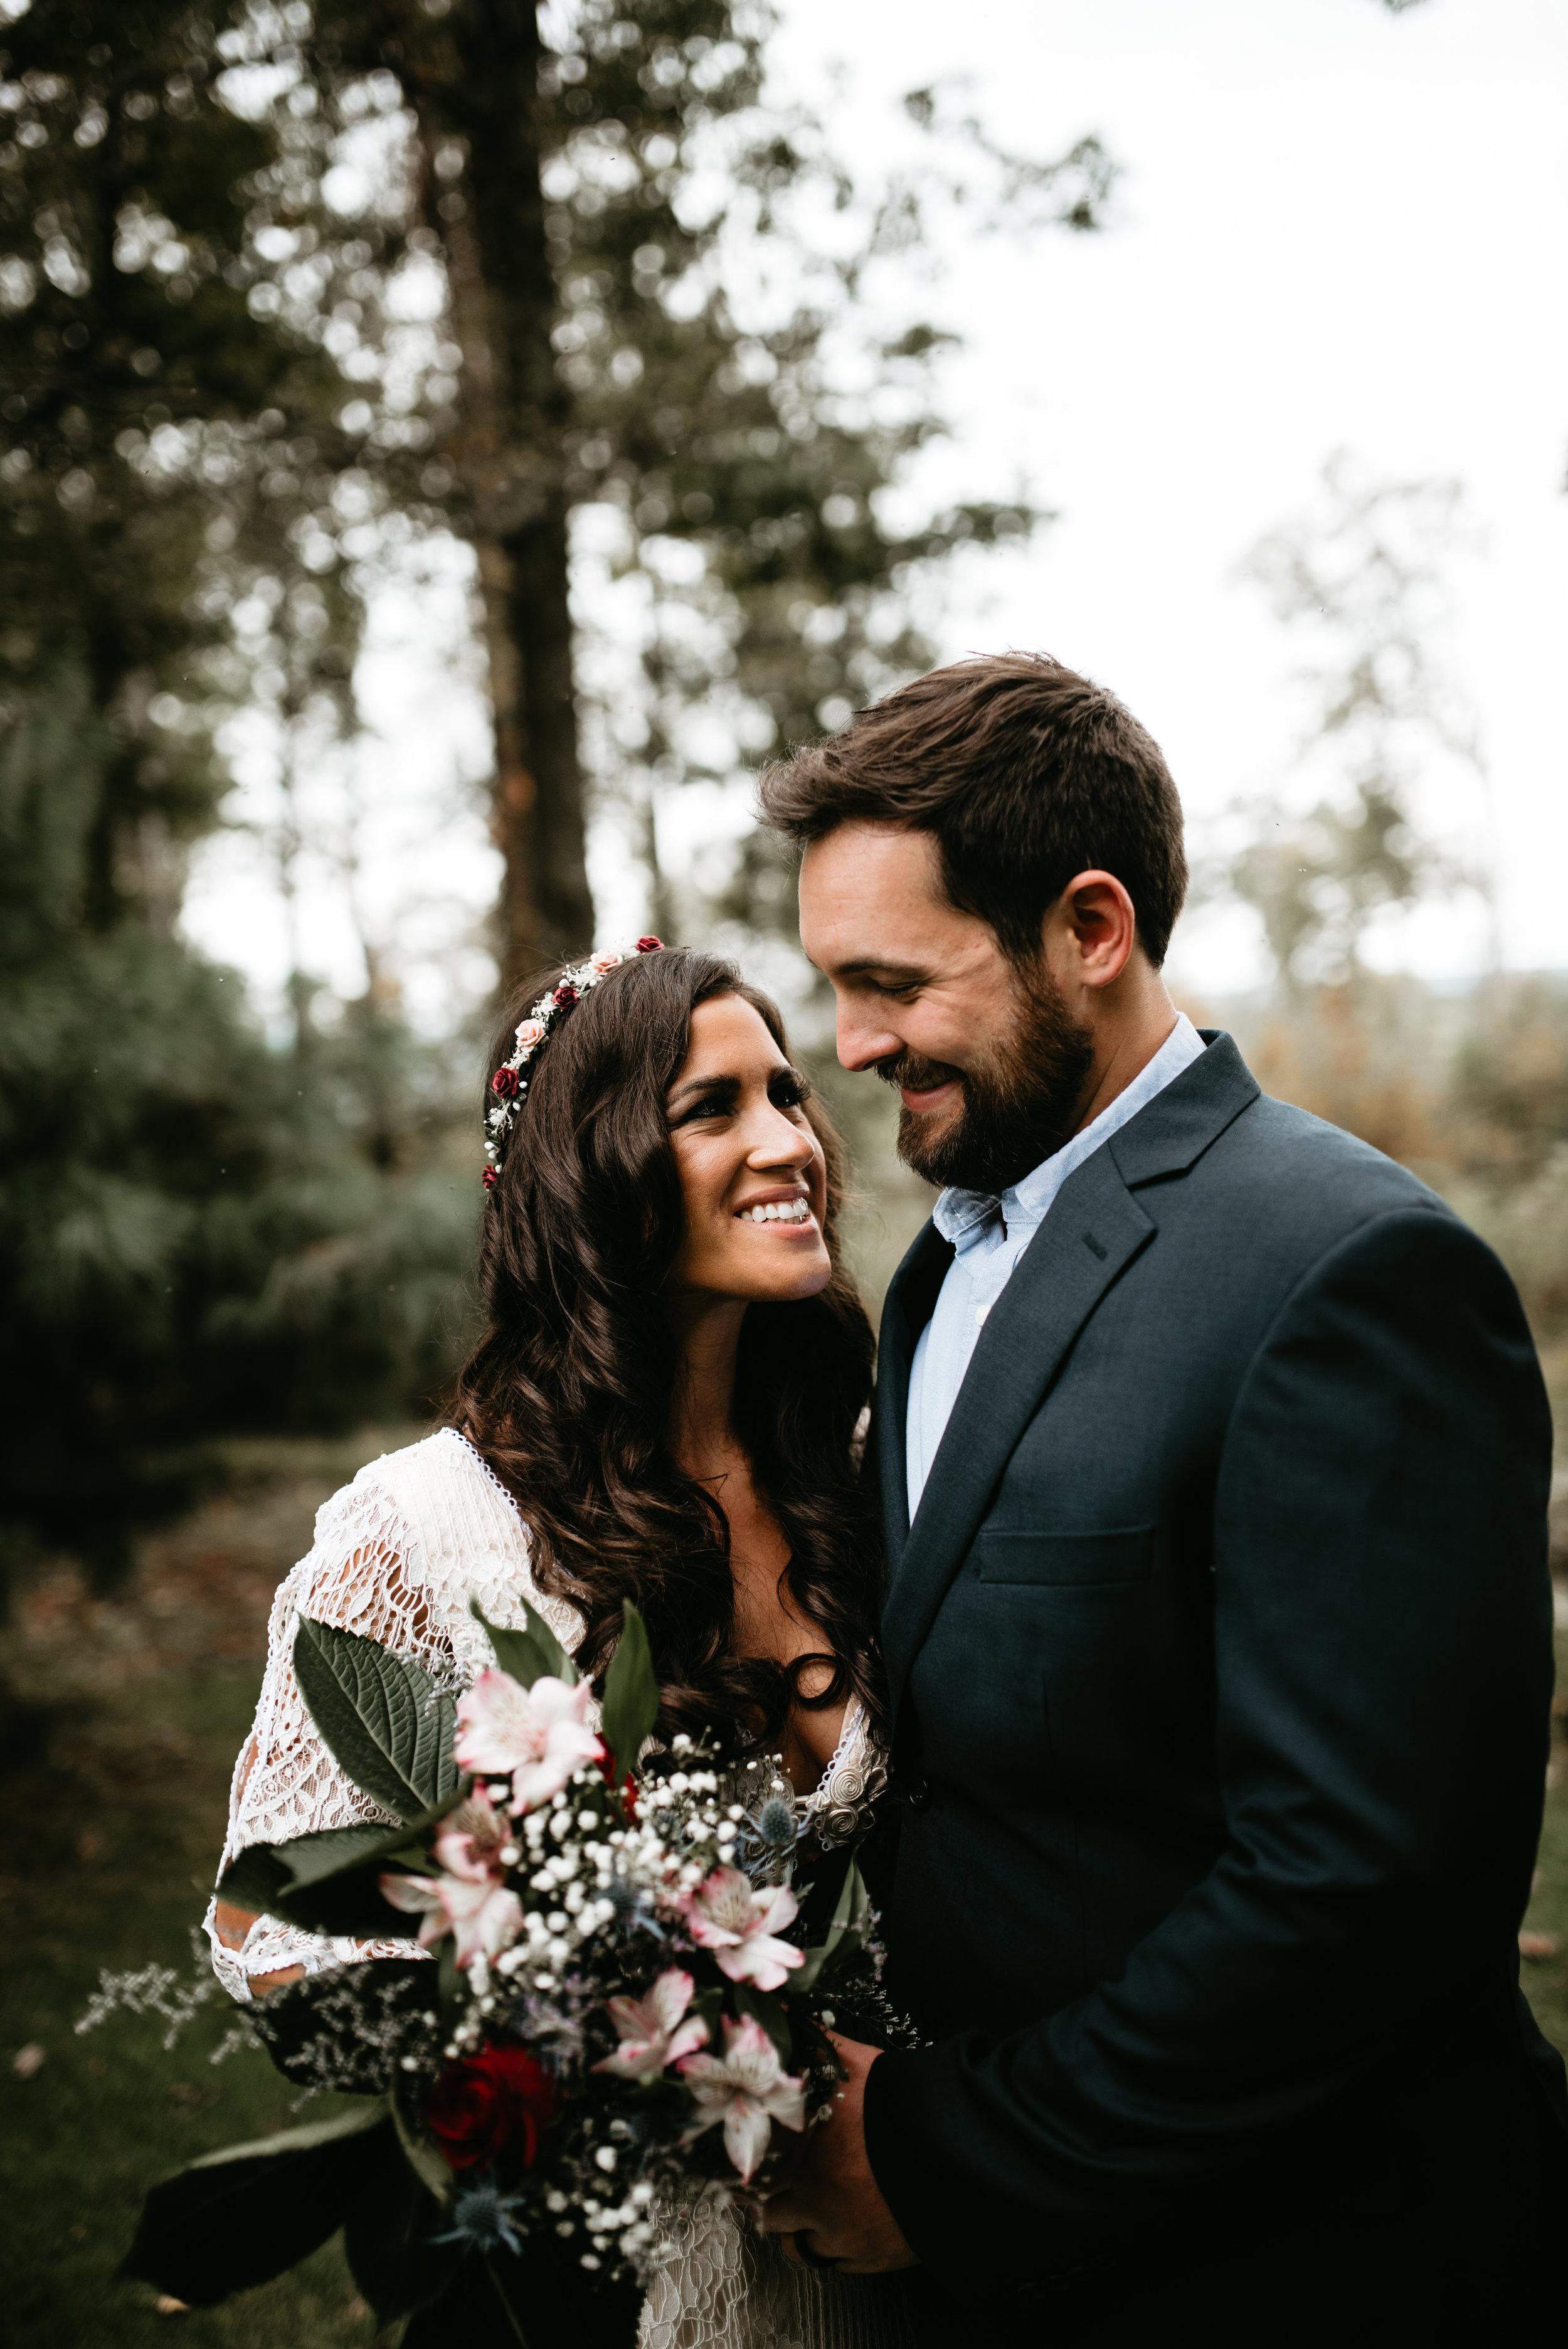 Destination elopement photographer in Dallas, PA